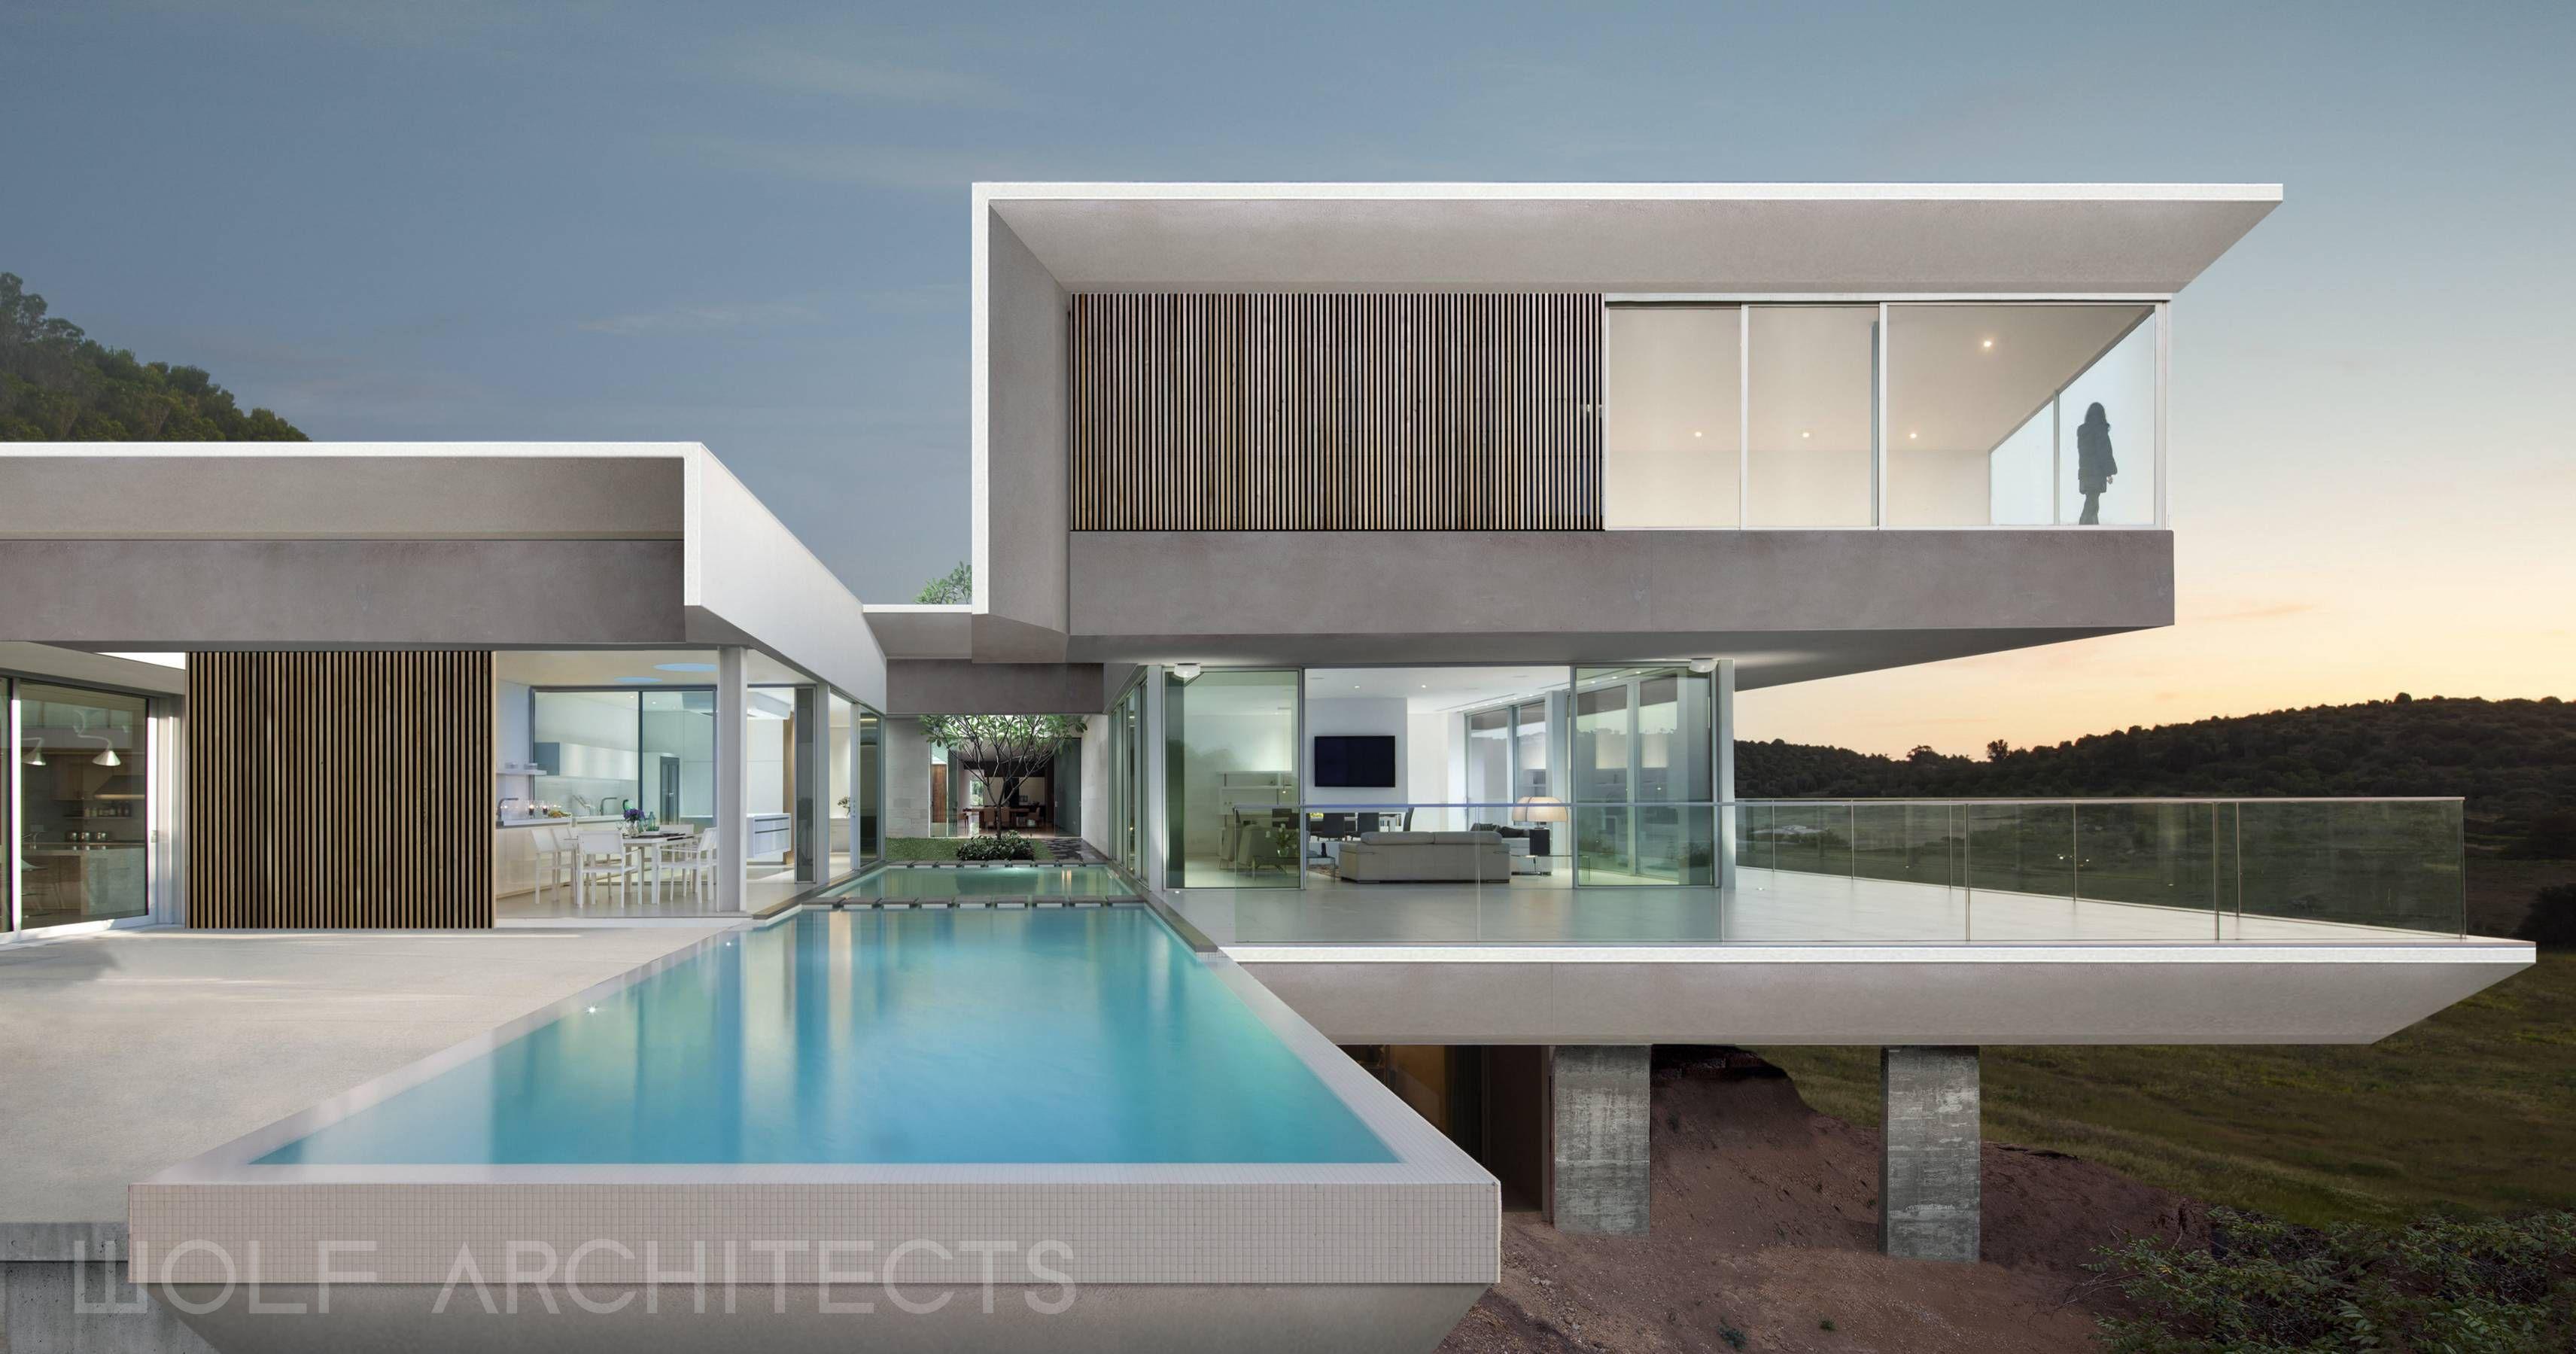 1000+ images about Modern villa design on Pinterest - ^